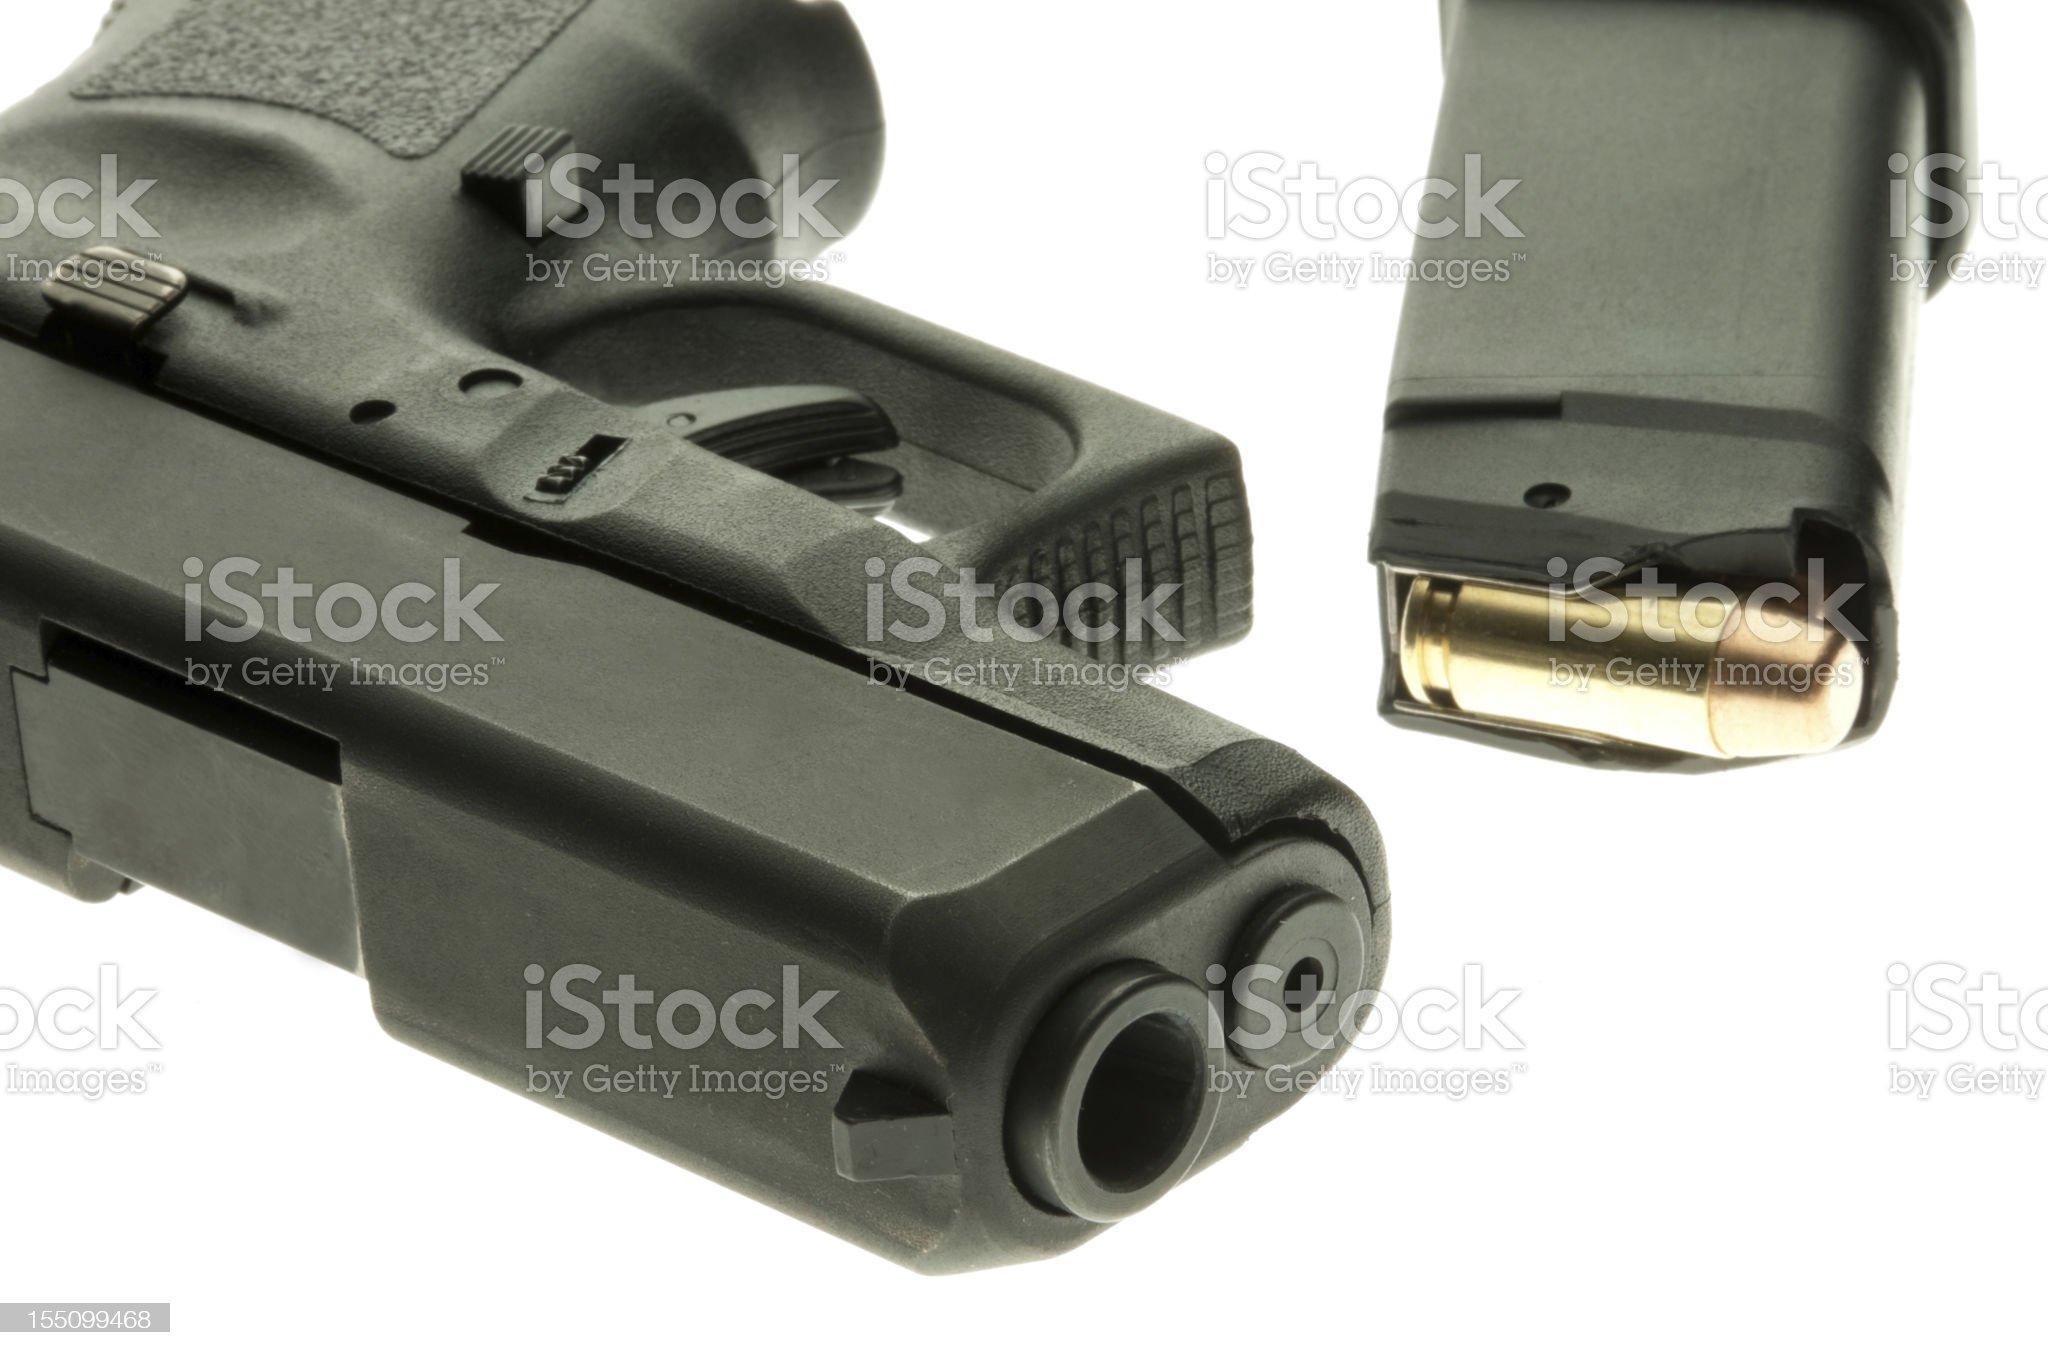 Handgun and full clip royalty-free stock photo